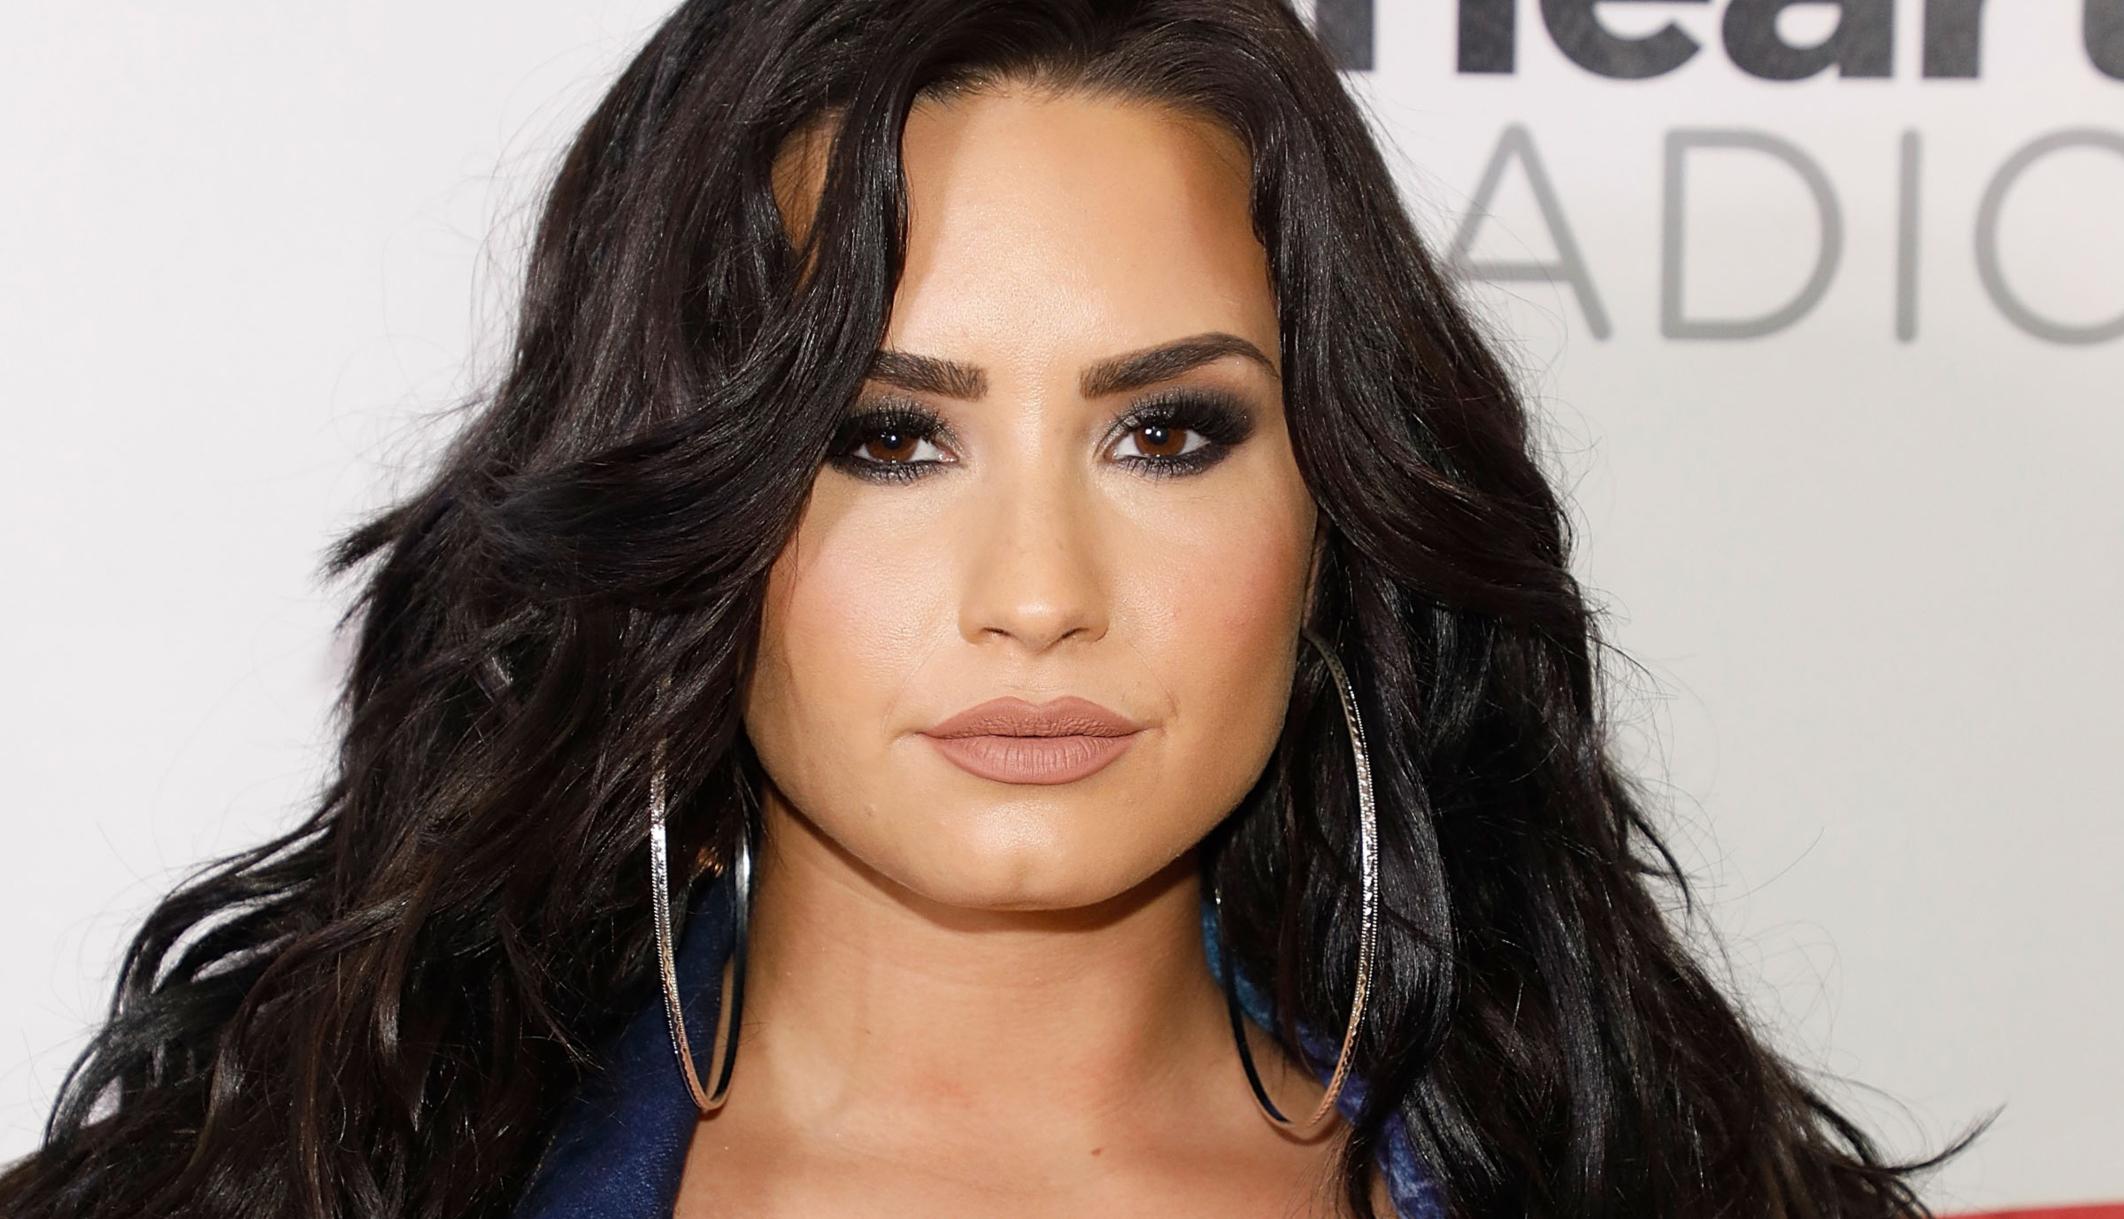 Nazivatelj 911 Demi Lovato navodno je pitao bolničare da ne koriste sirene nakon očitog predoziranja